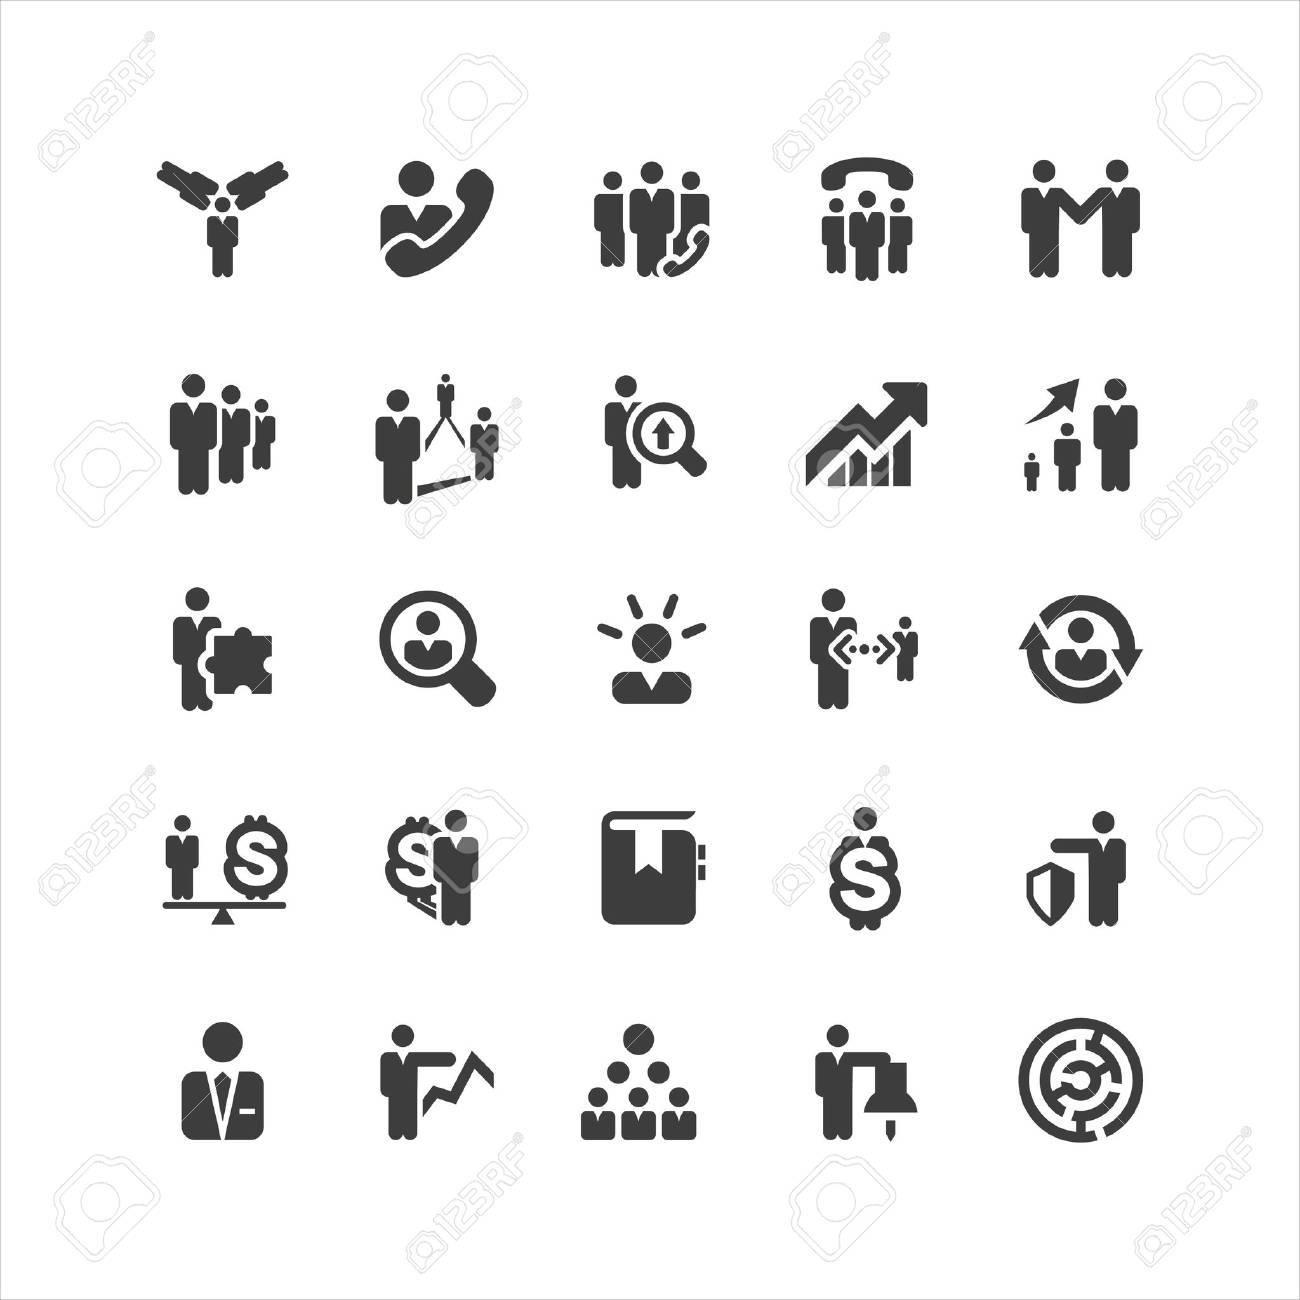 Retina Business Icons Set Stock Vector - 19247023